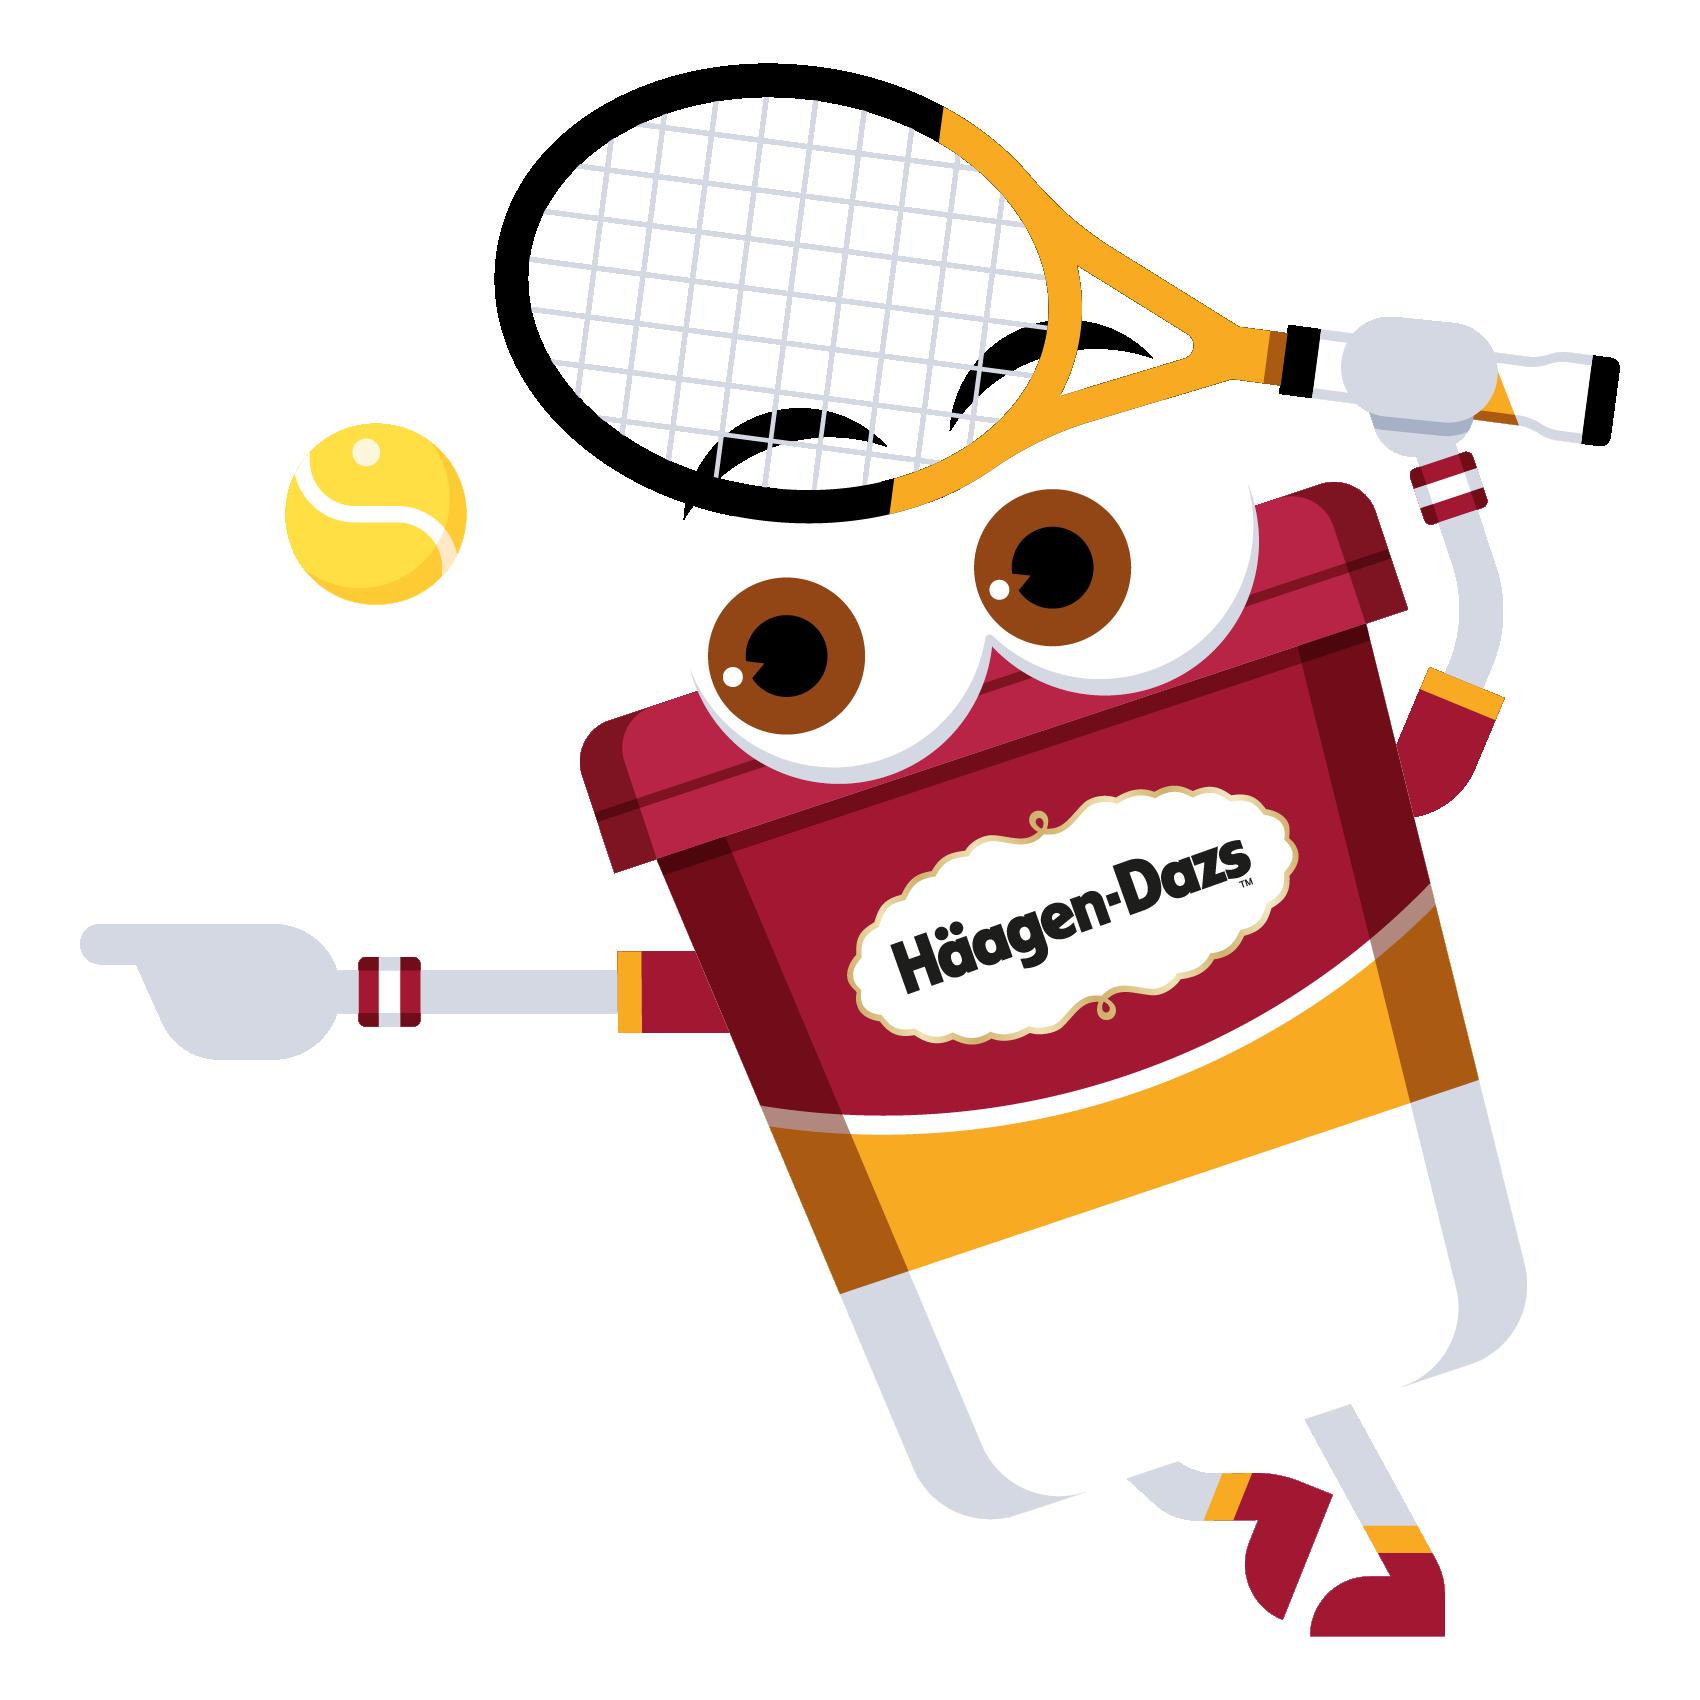 Emoji clipart tennis. H agen dazs france